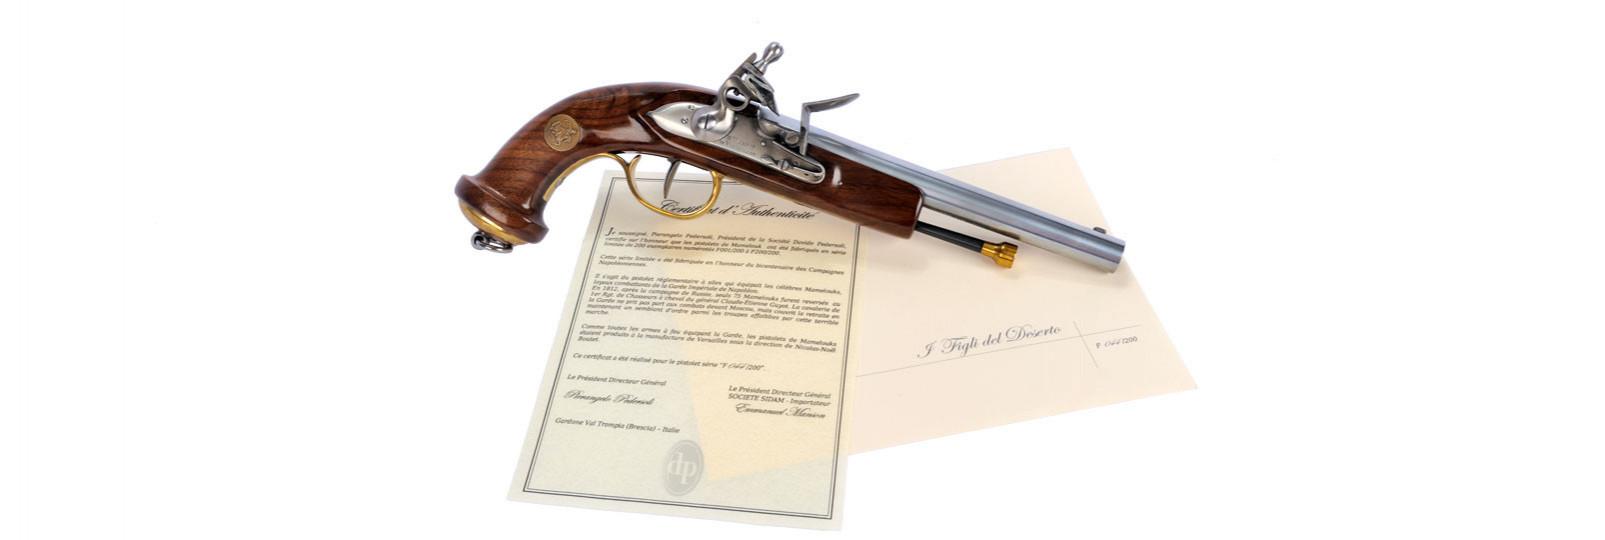 Mamelouk commemoratve 14,5mm